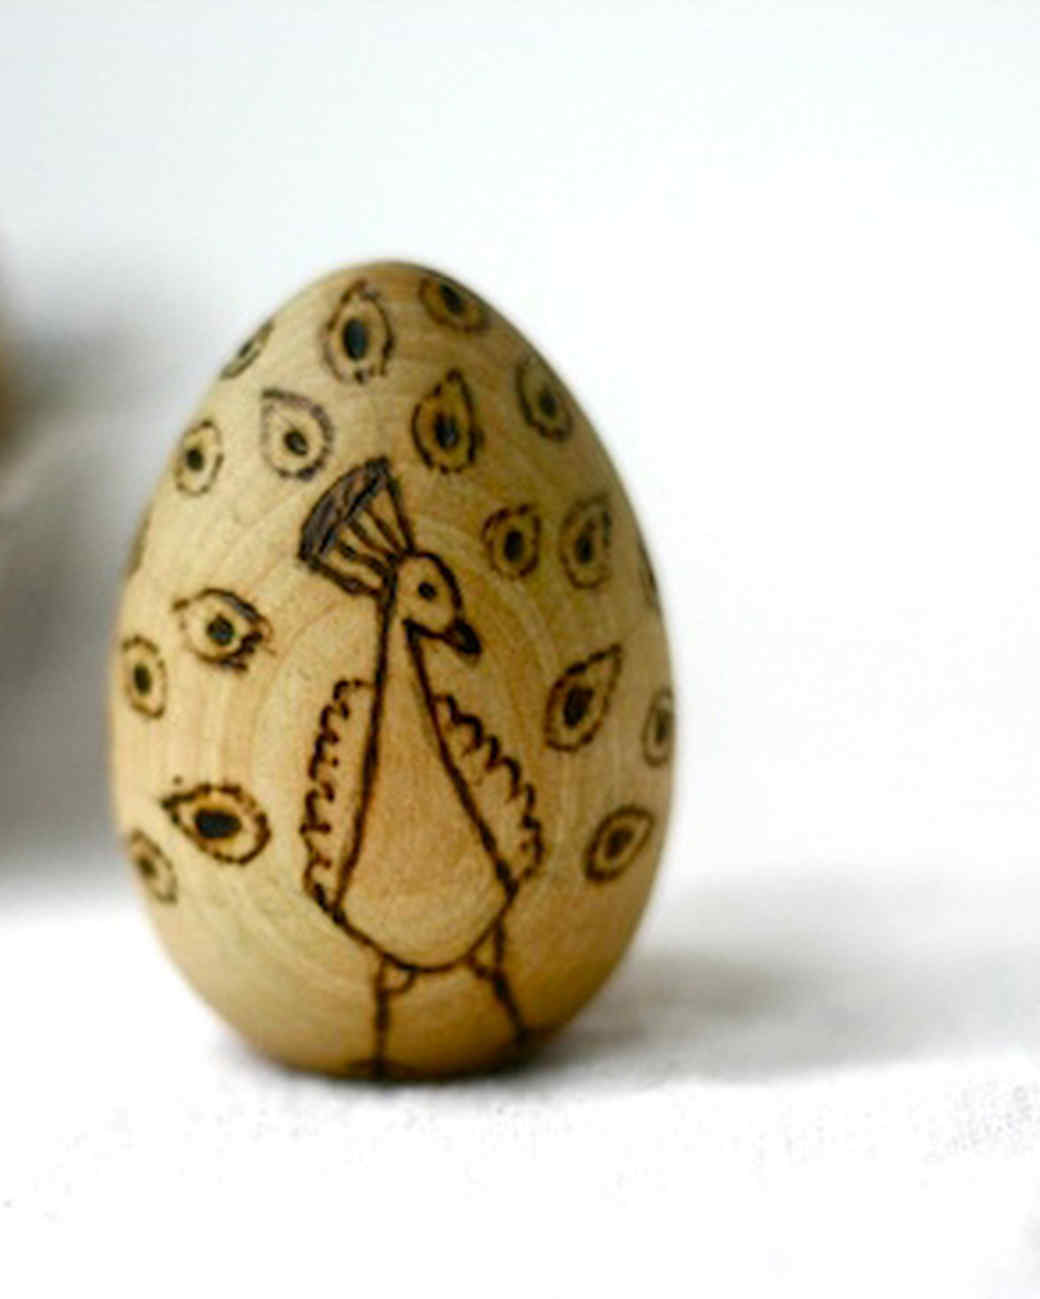 marthas-egg-hunt-cindy-young-0414.jpg